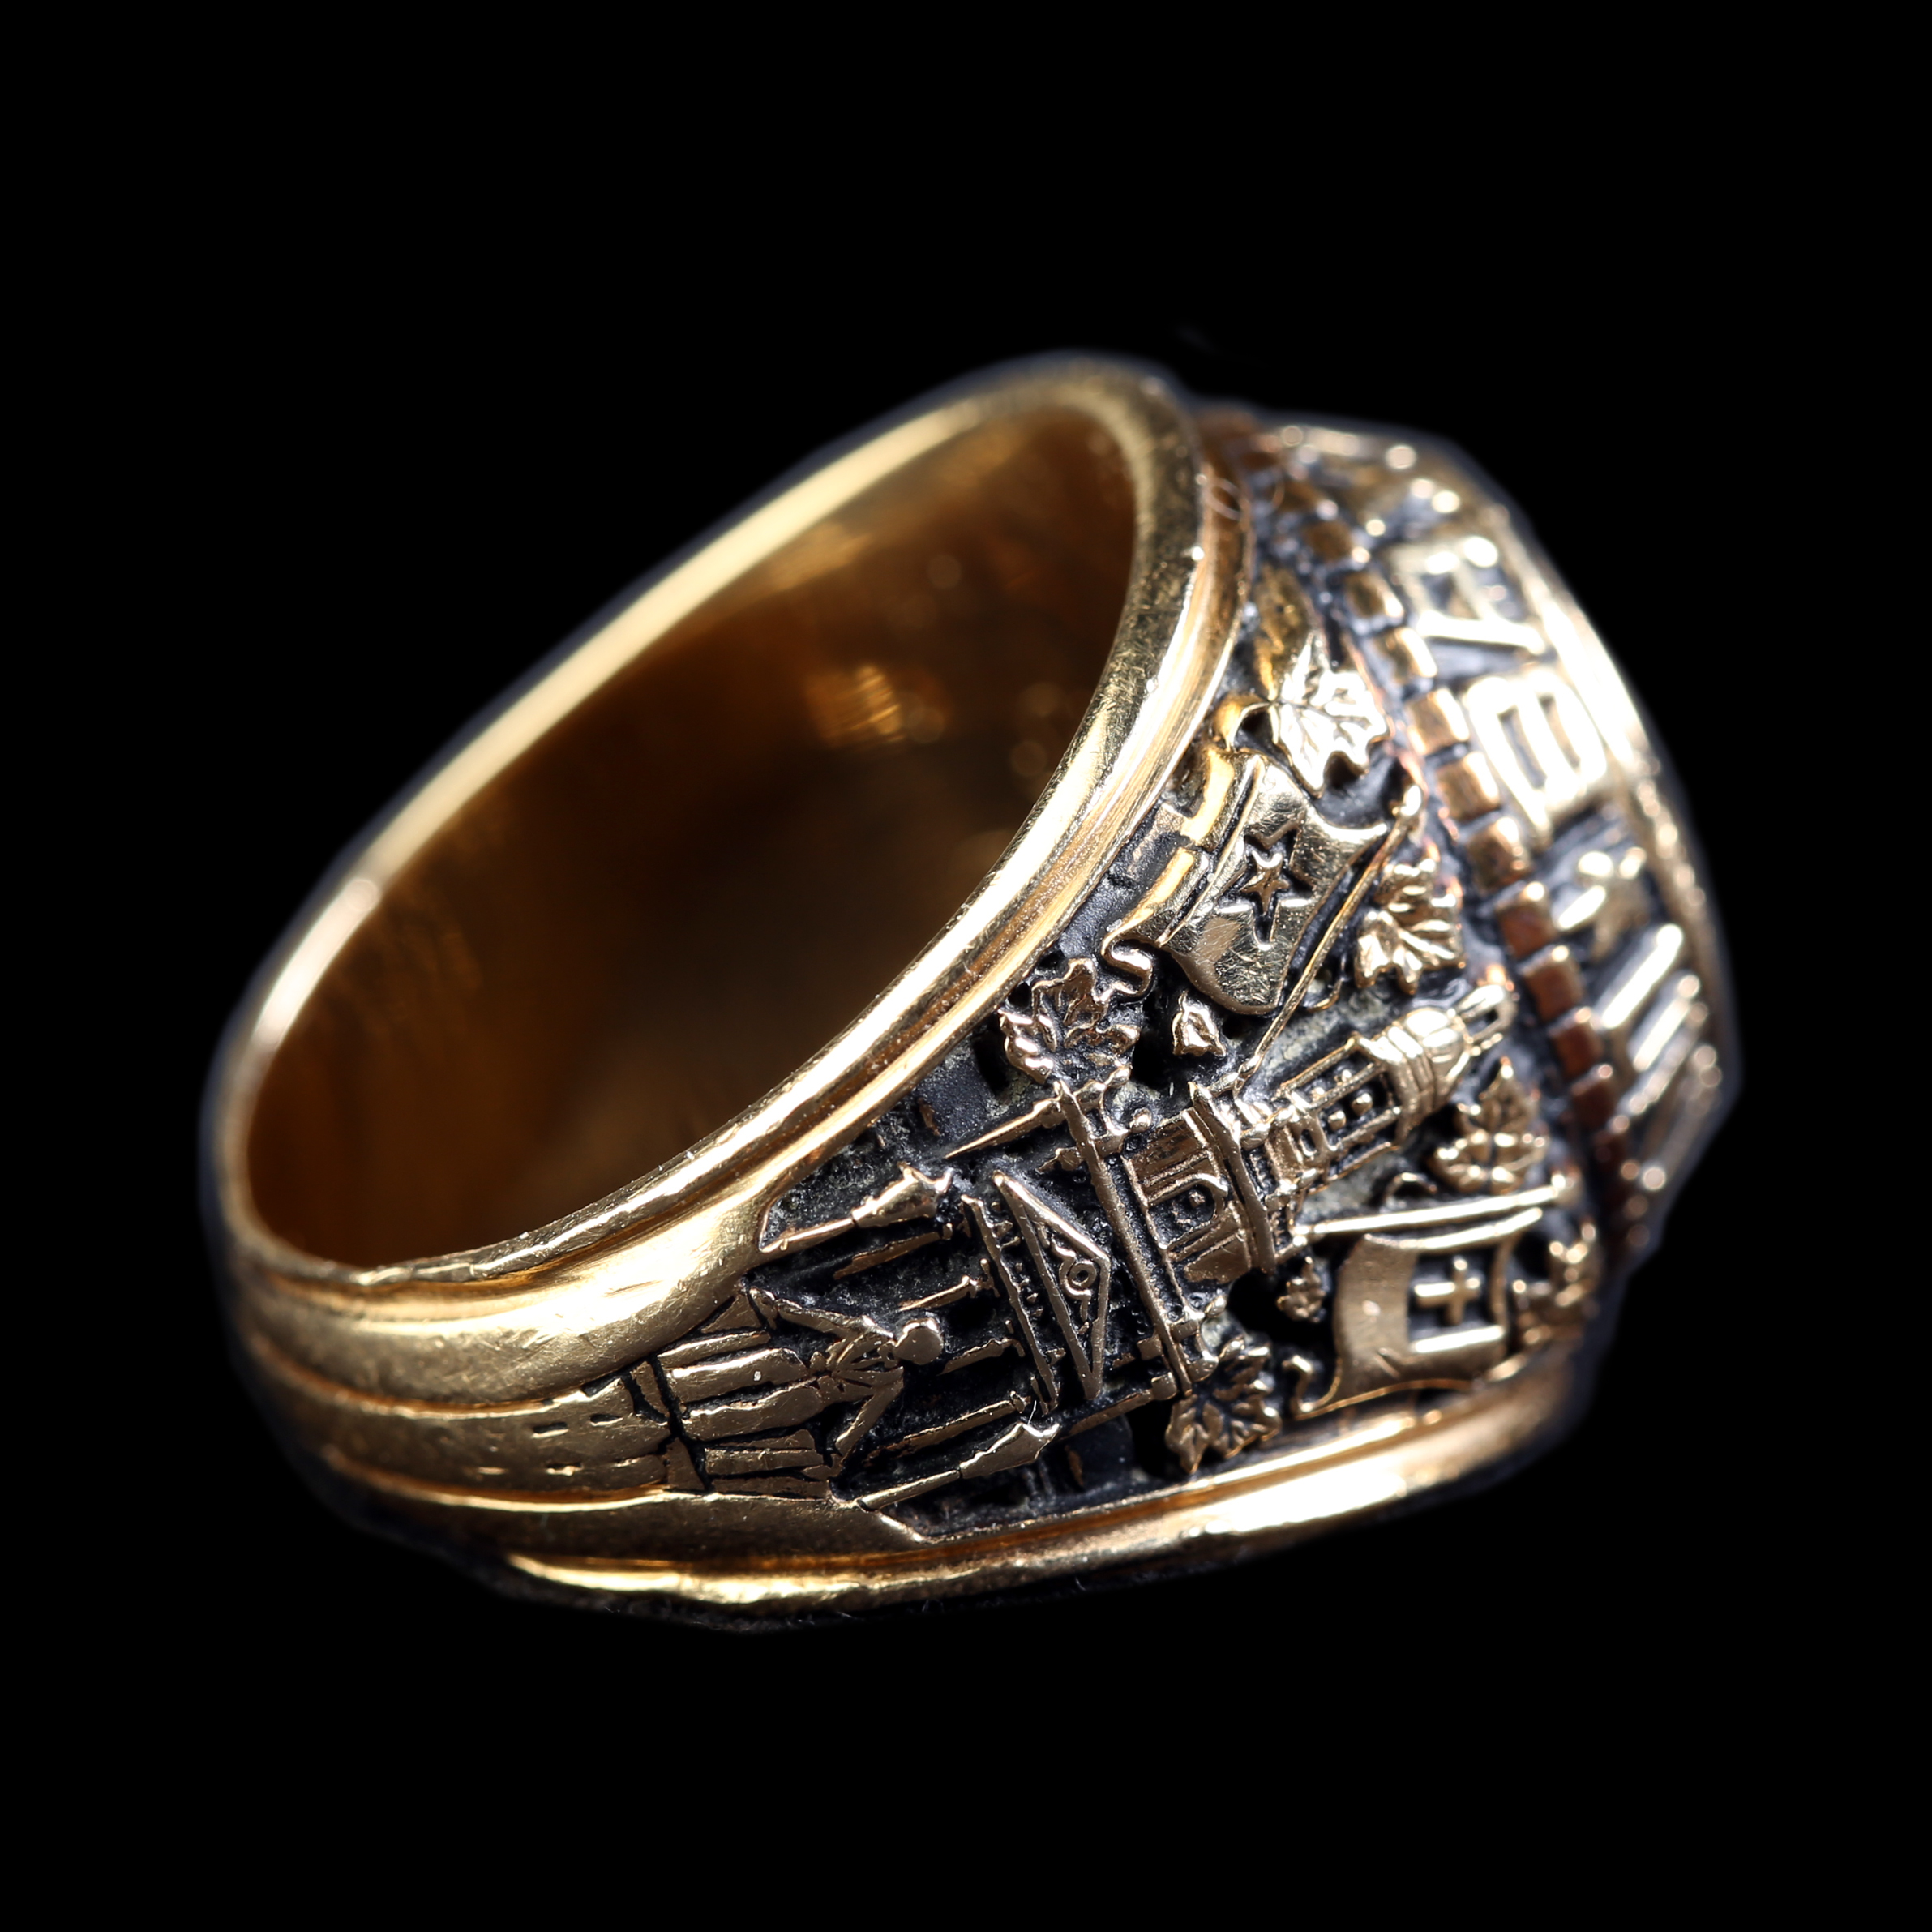 Baylor University  Baylor Alumni Programs  History. 15 Year Wedding Rings. Opel Wedding Rings. Love Cartier Rings. Mens Outdoor Wedding Rings. Signet Ring Engagement Rings. Precious Gemstone Wedding Rings. Rough Cut Engagement Rings. Mynamepix Com Wedding Rings